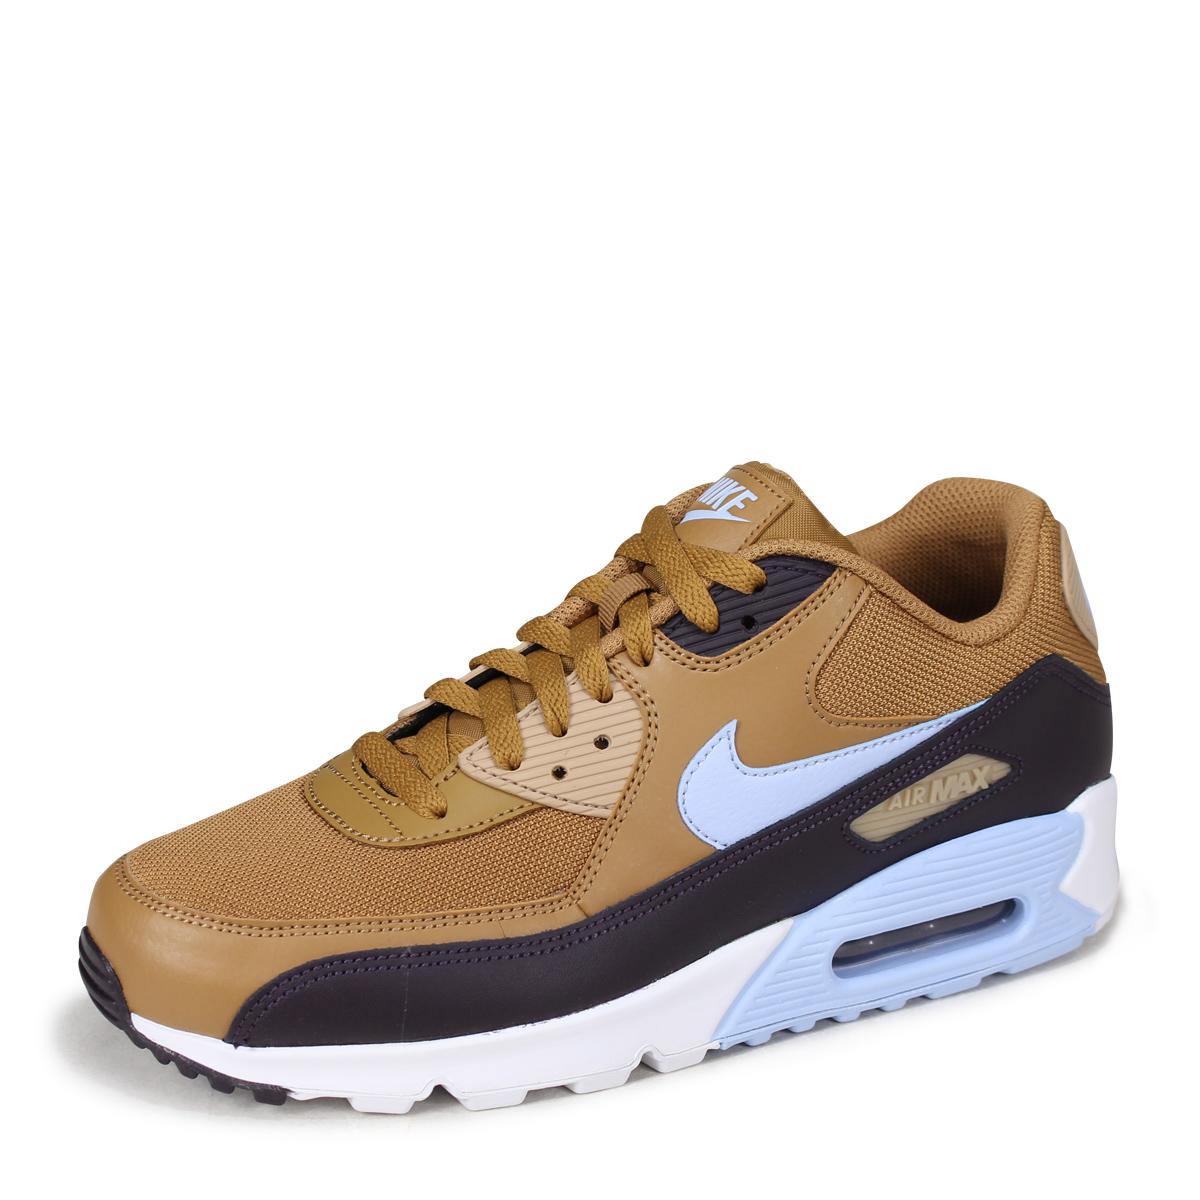 NIKE AIR MAX 90 ESSENTIAL Kie Ney AMAX 90 essential sneakers men AJ1285-202  brown  7 13 Shinnyu load   187  cd80f5ca6